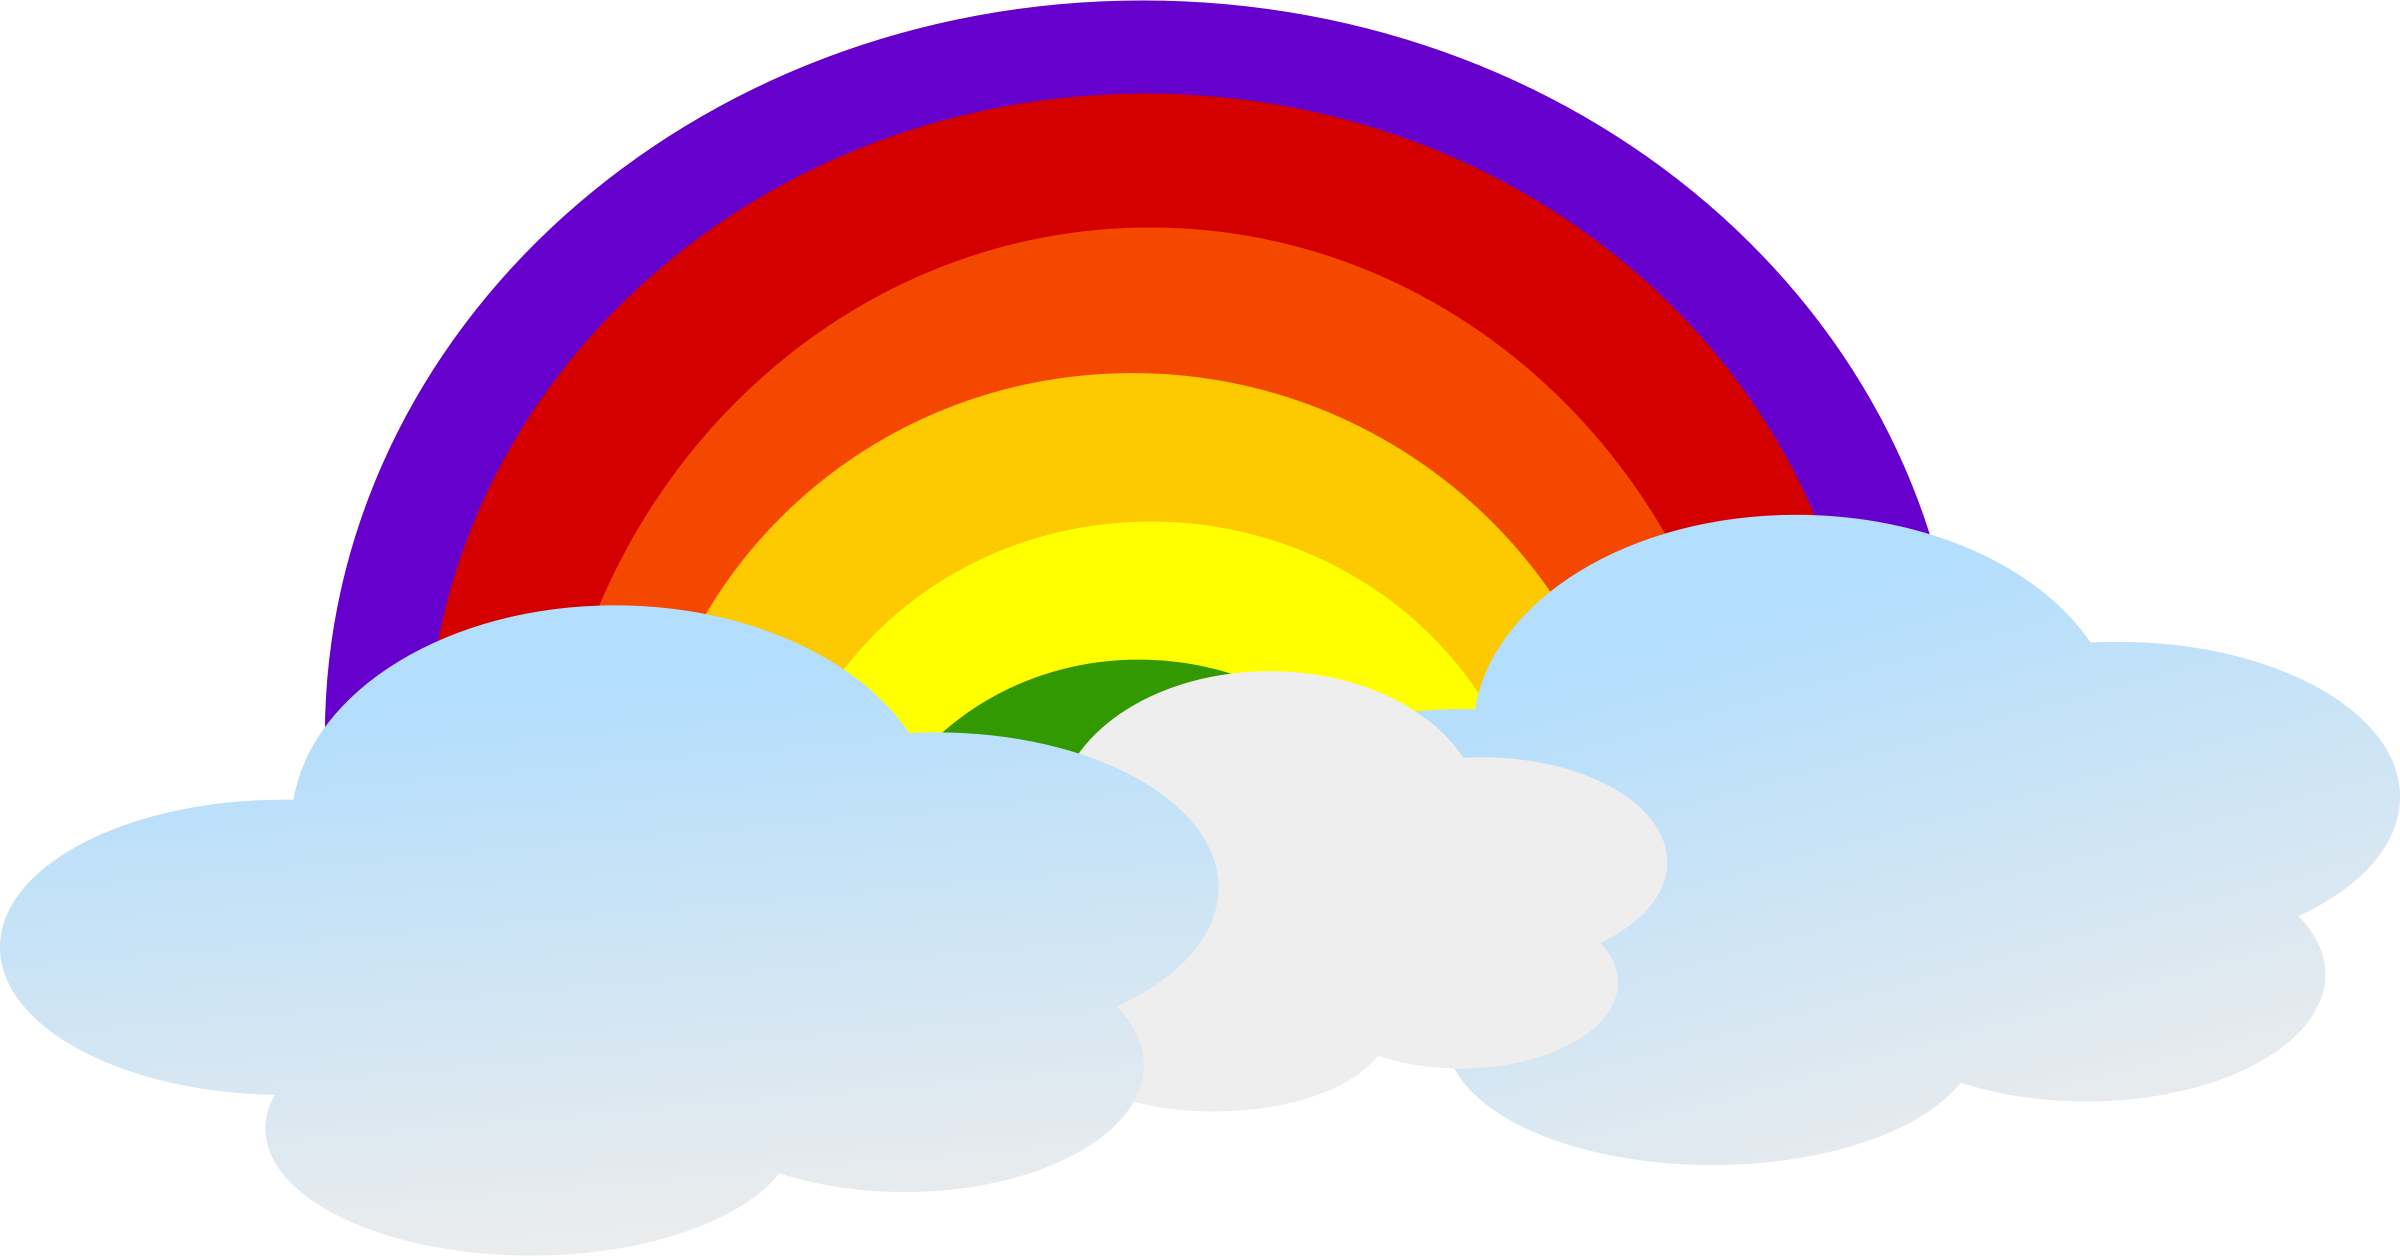 Cartoon clouds kid. Rain clipart free download